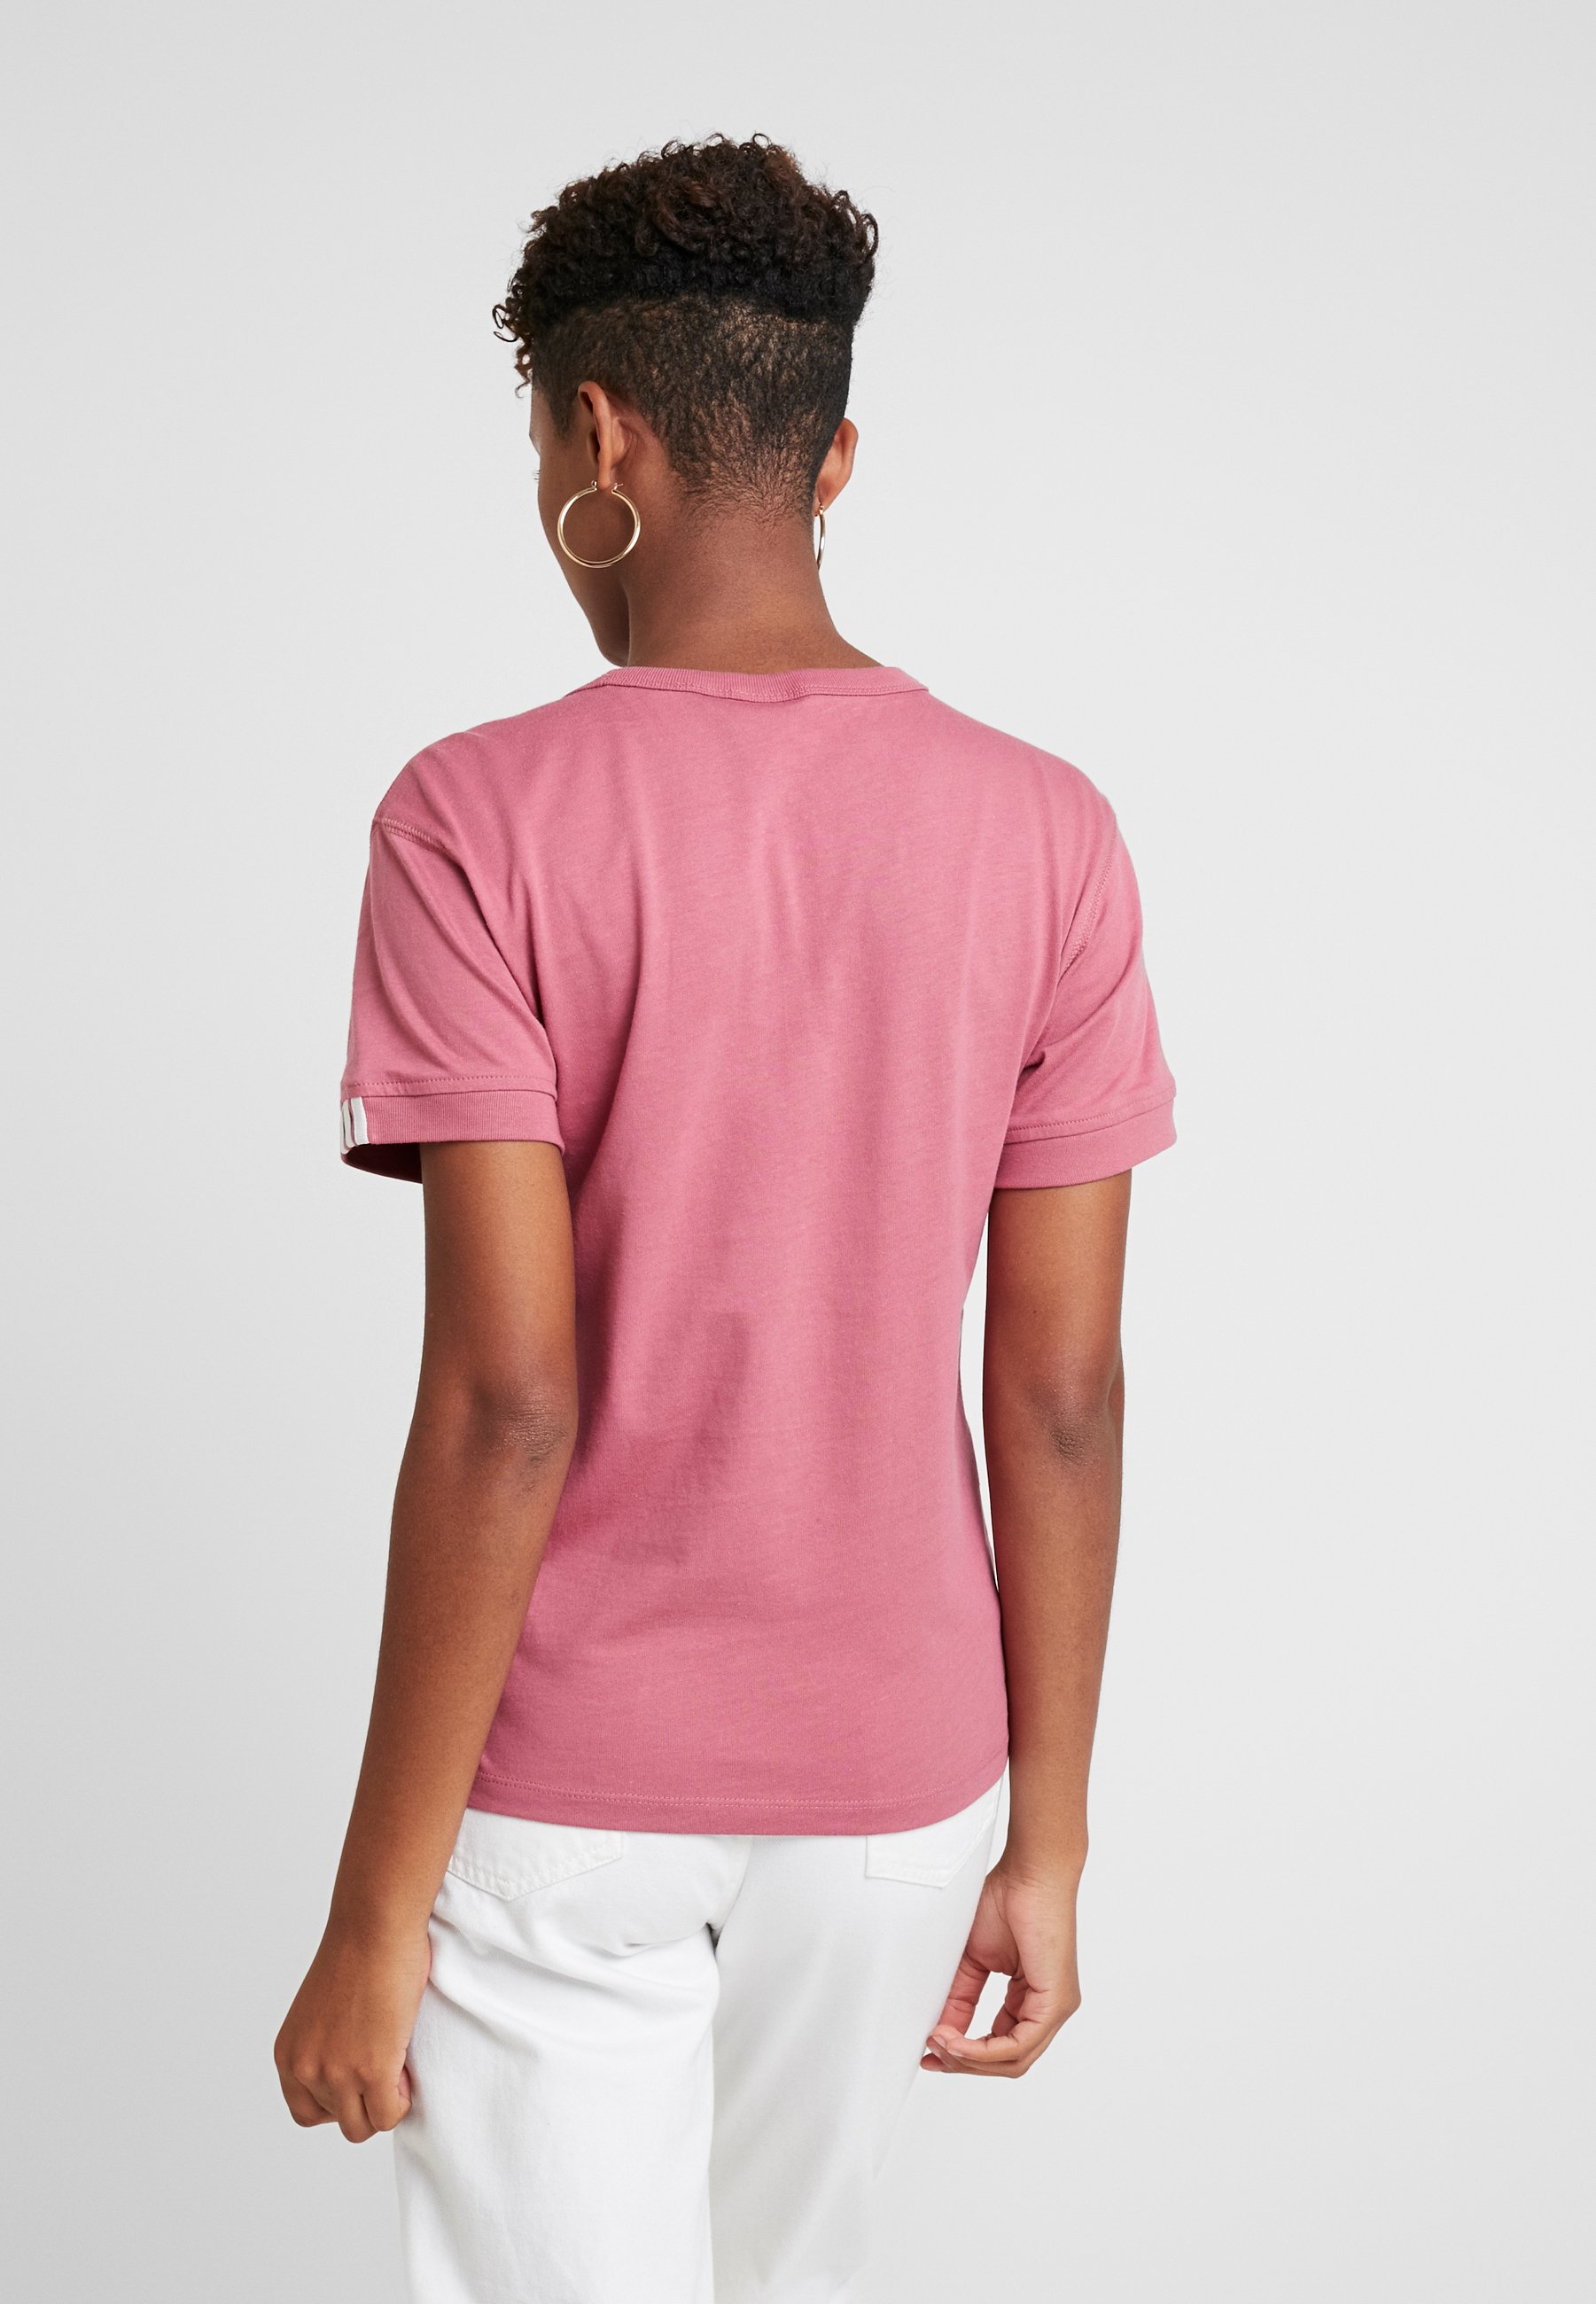 RETRO shirt LOGO trace adidas Originals TEET maroon imprimé f76ybgY